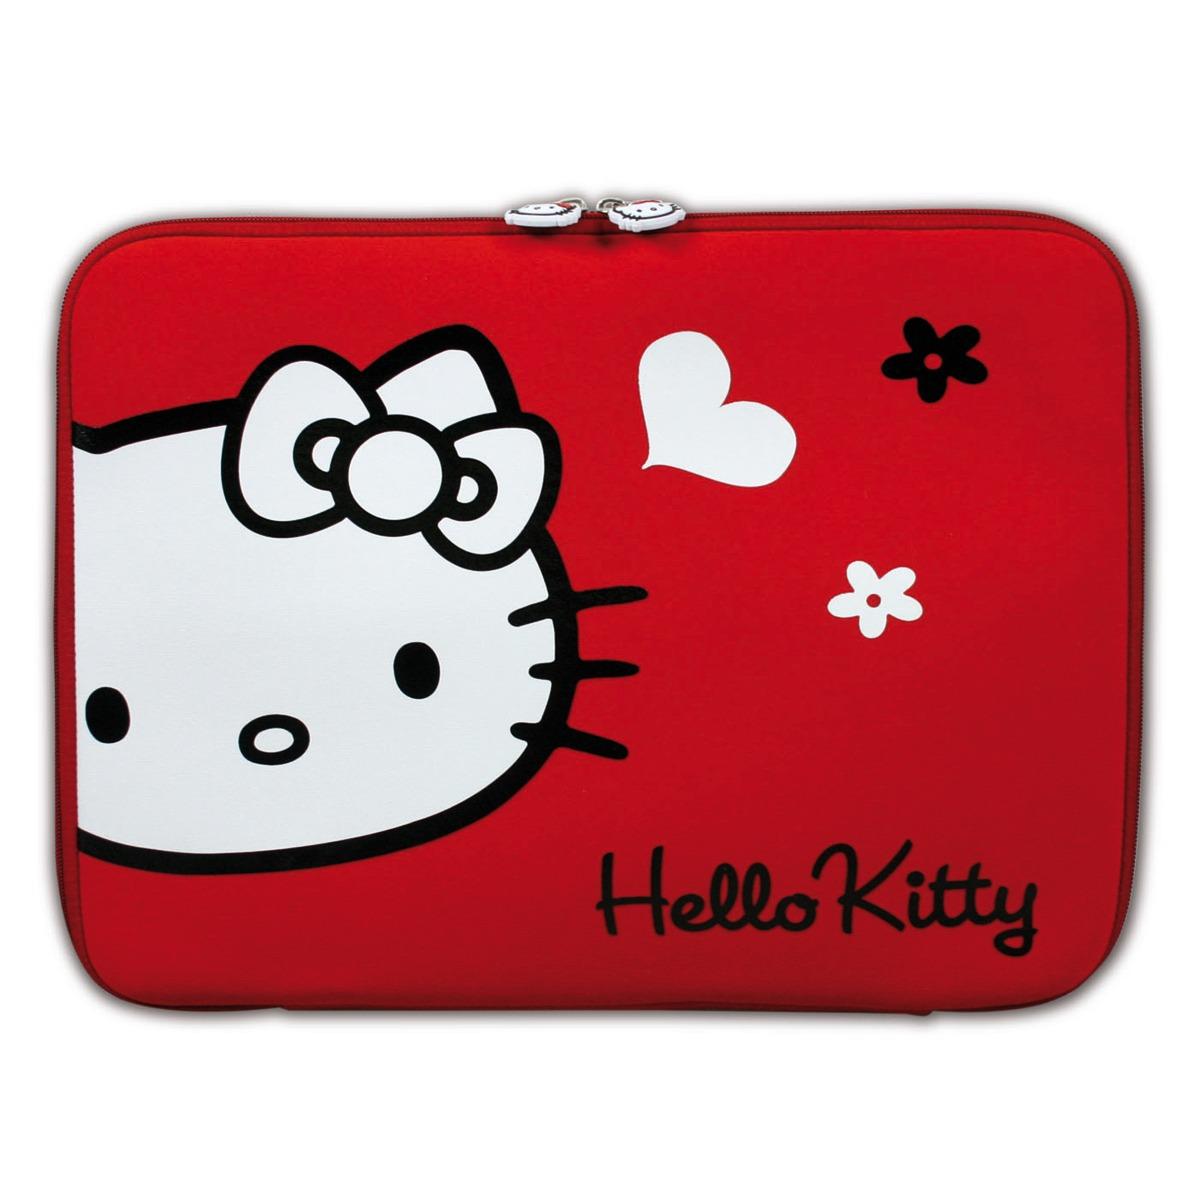 port designs hello kitty skin 15 6 rouge sac sacoche housse port designs sur. Black Bedroom Furniture Sets. Home Design Ideas